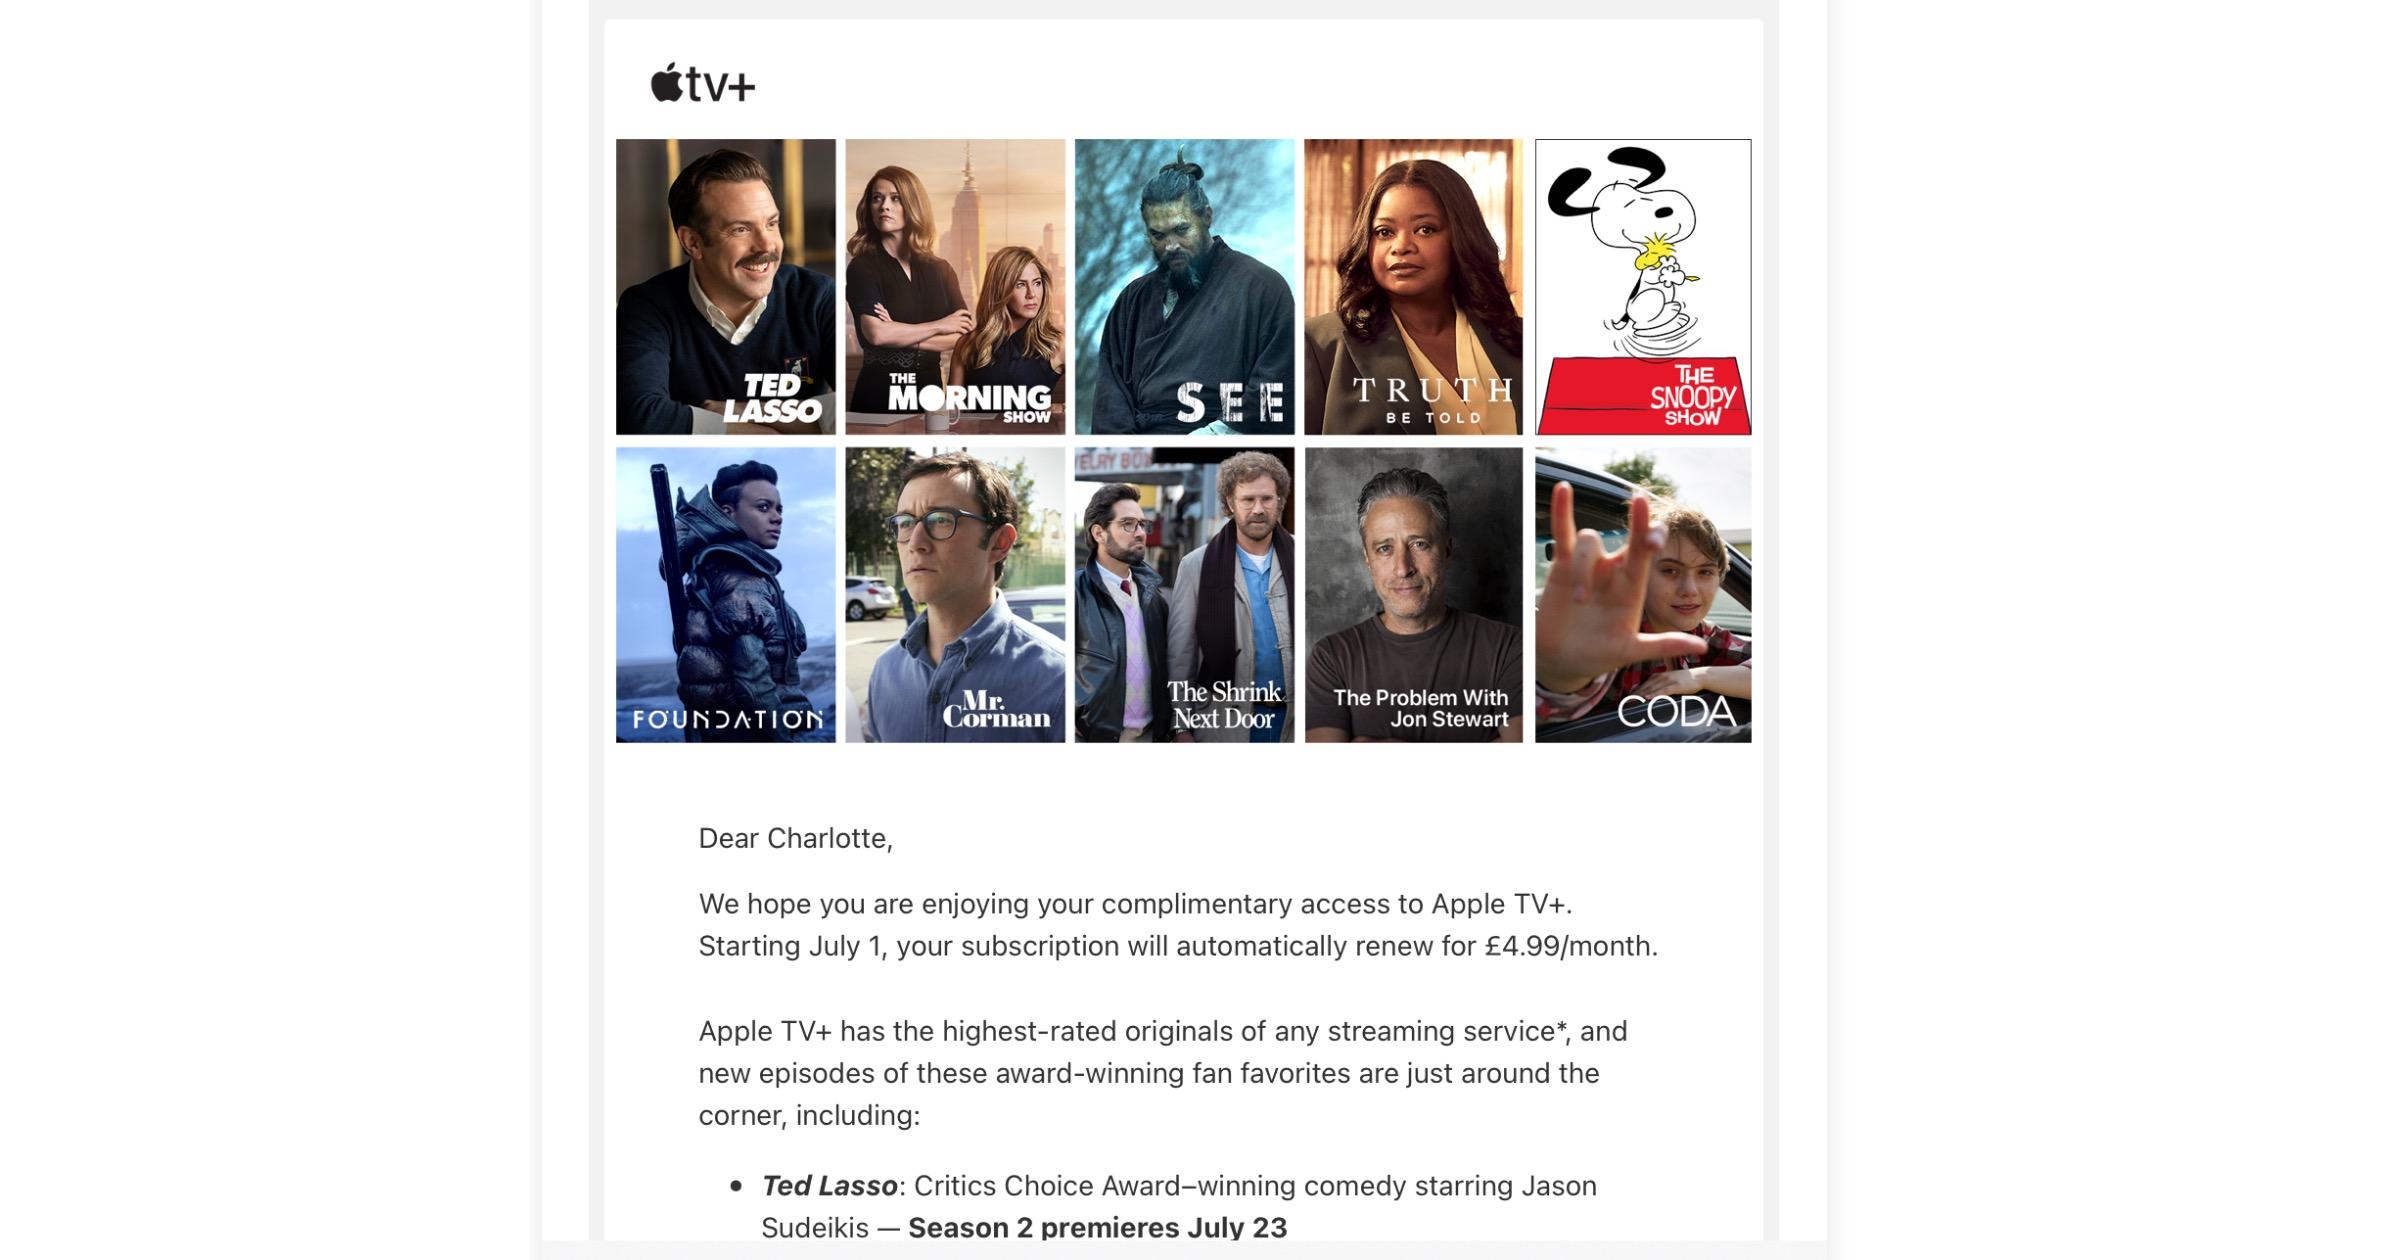 Apple TV+ renewal email